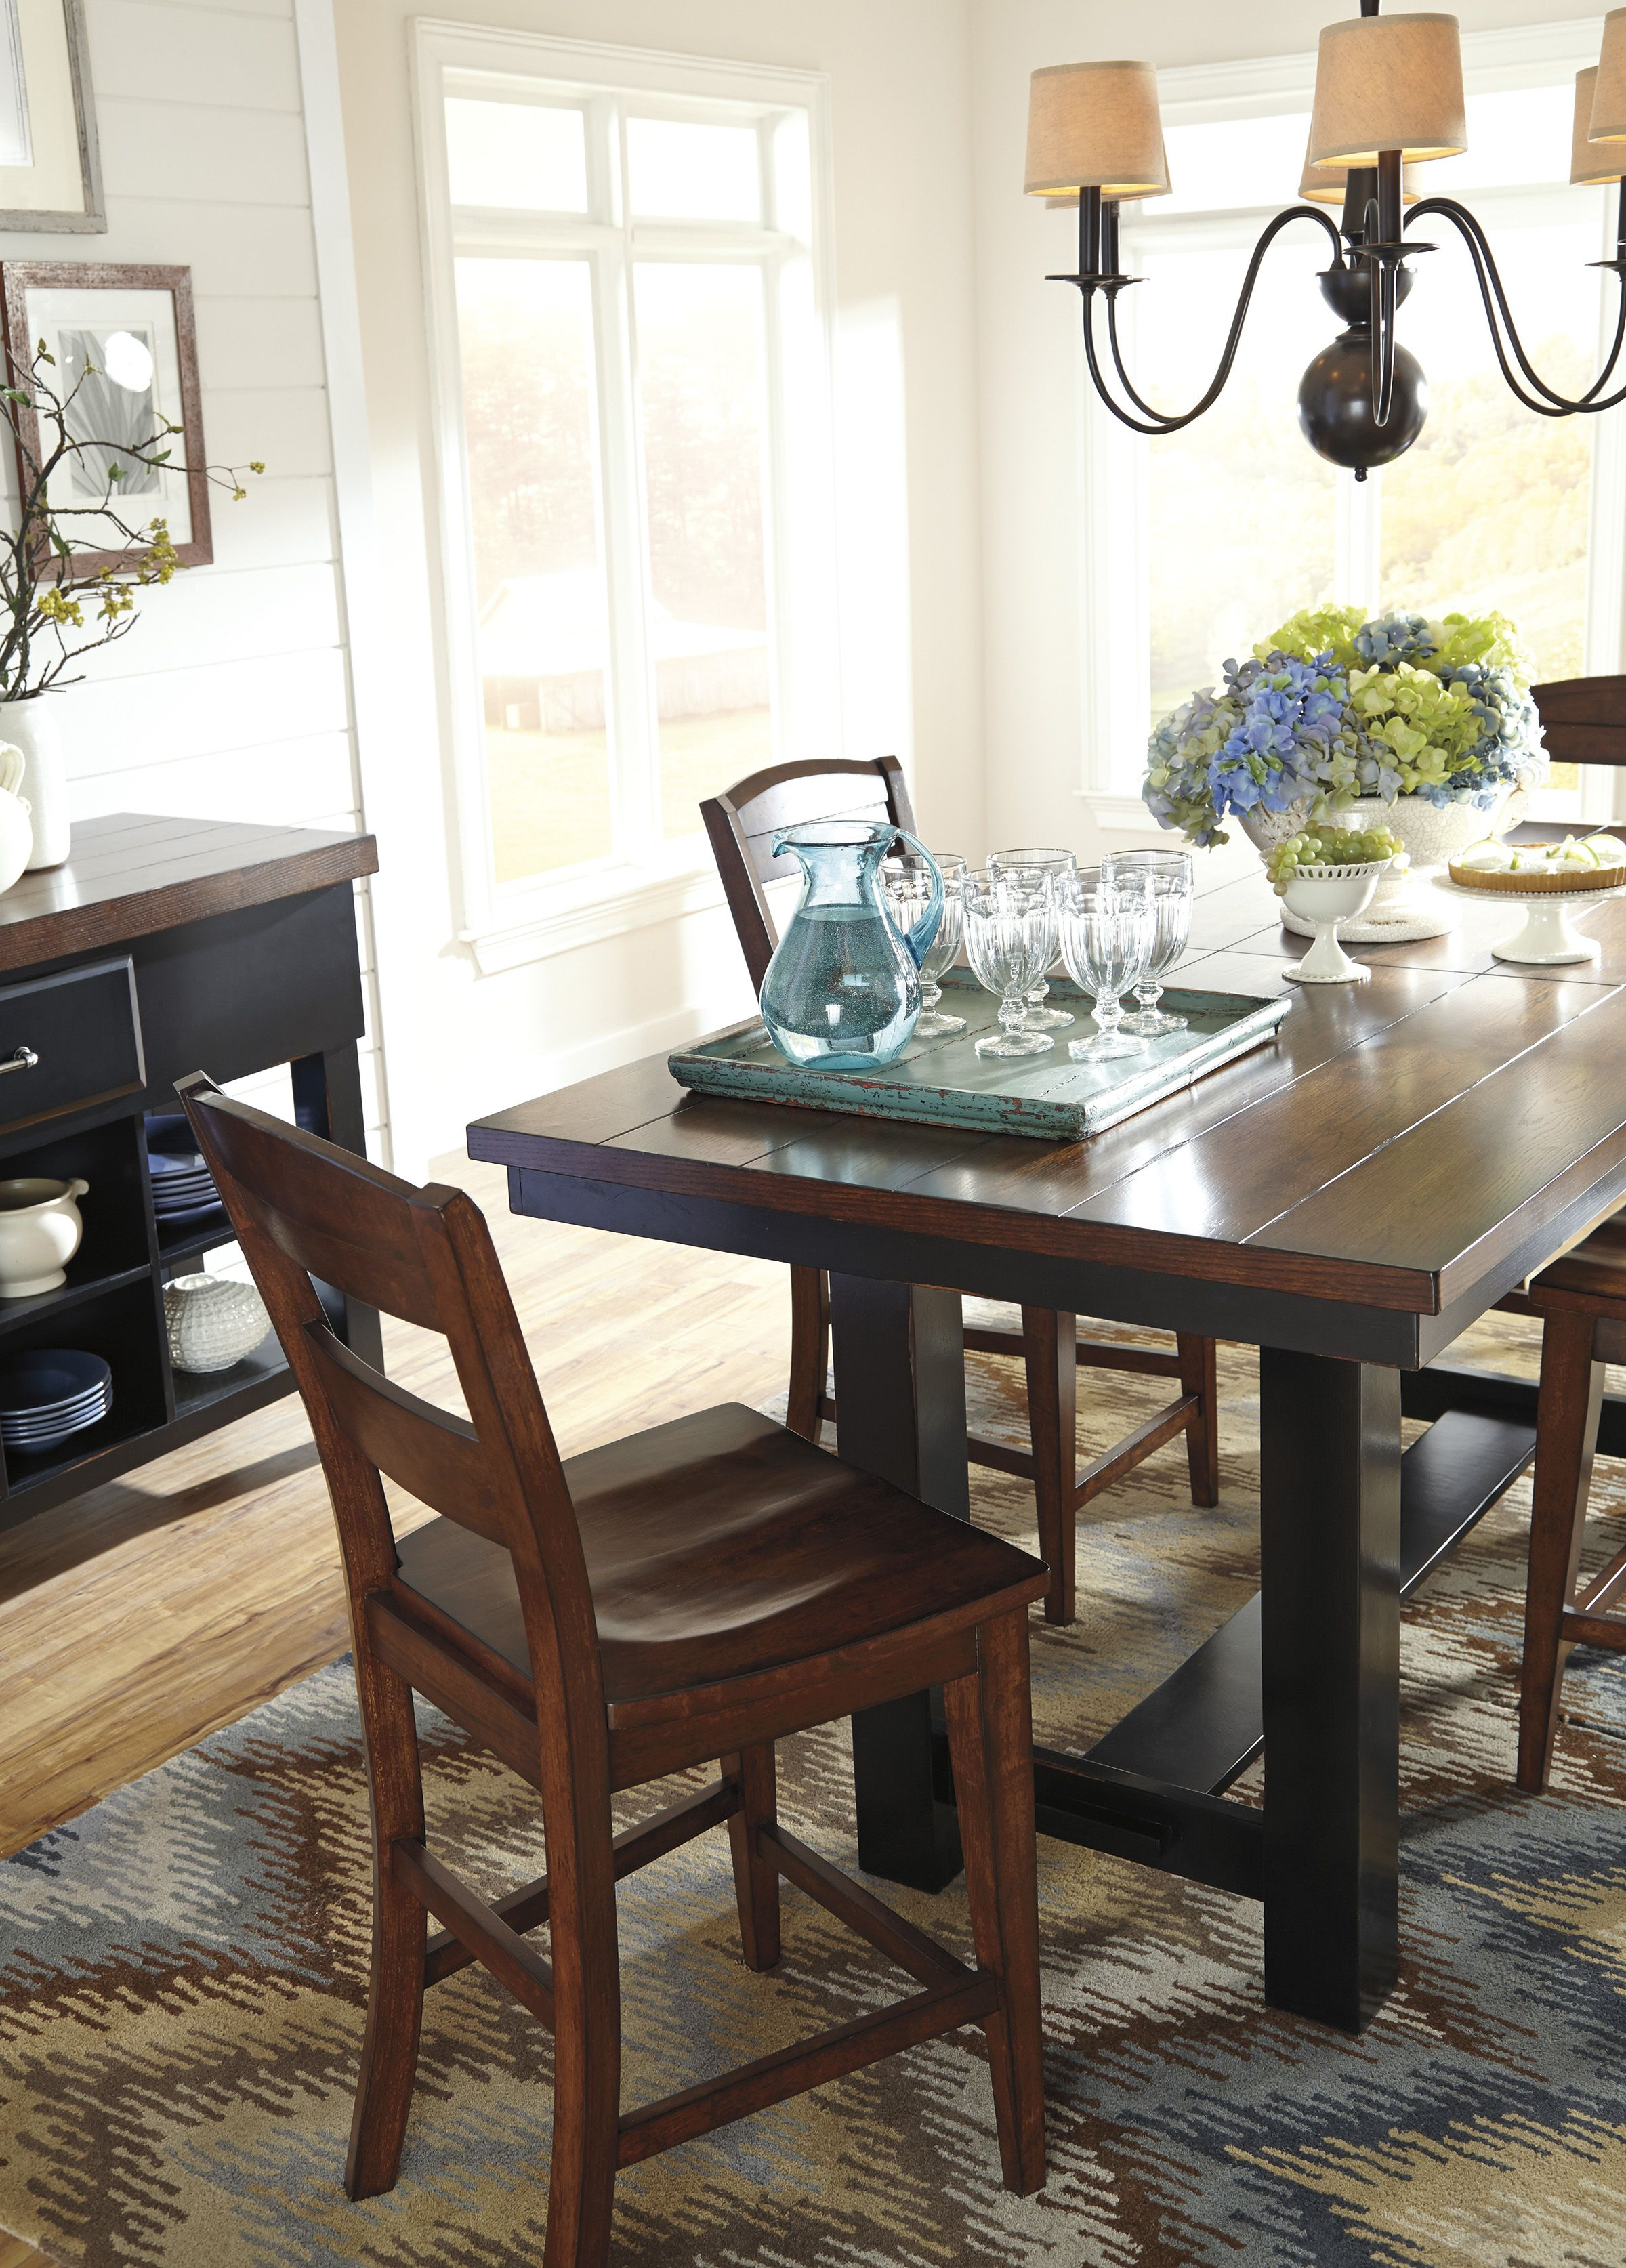 #furniture #home #DiningRoom #Trendy www.ABFMarietta.com